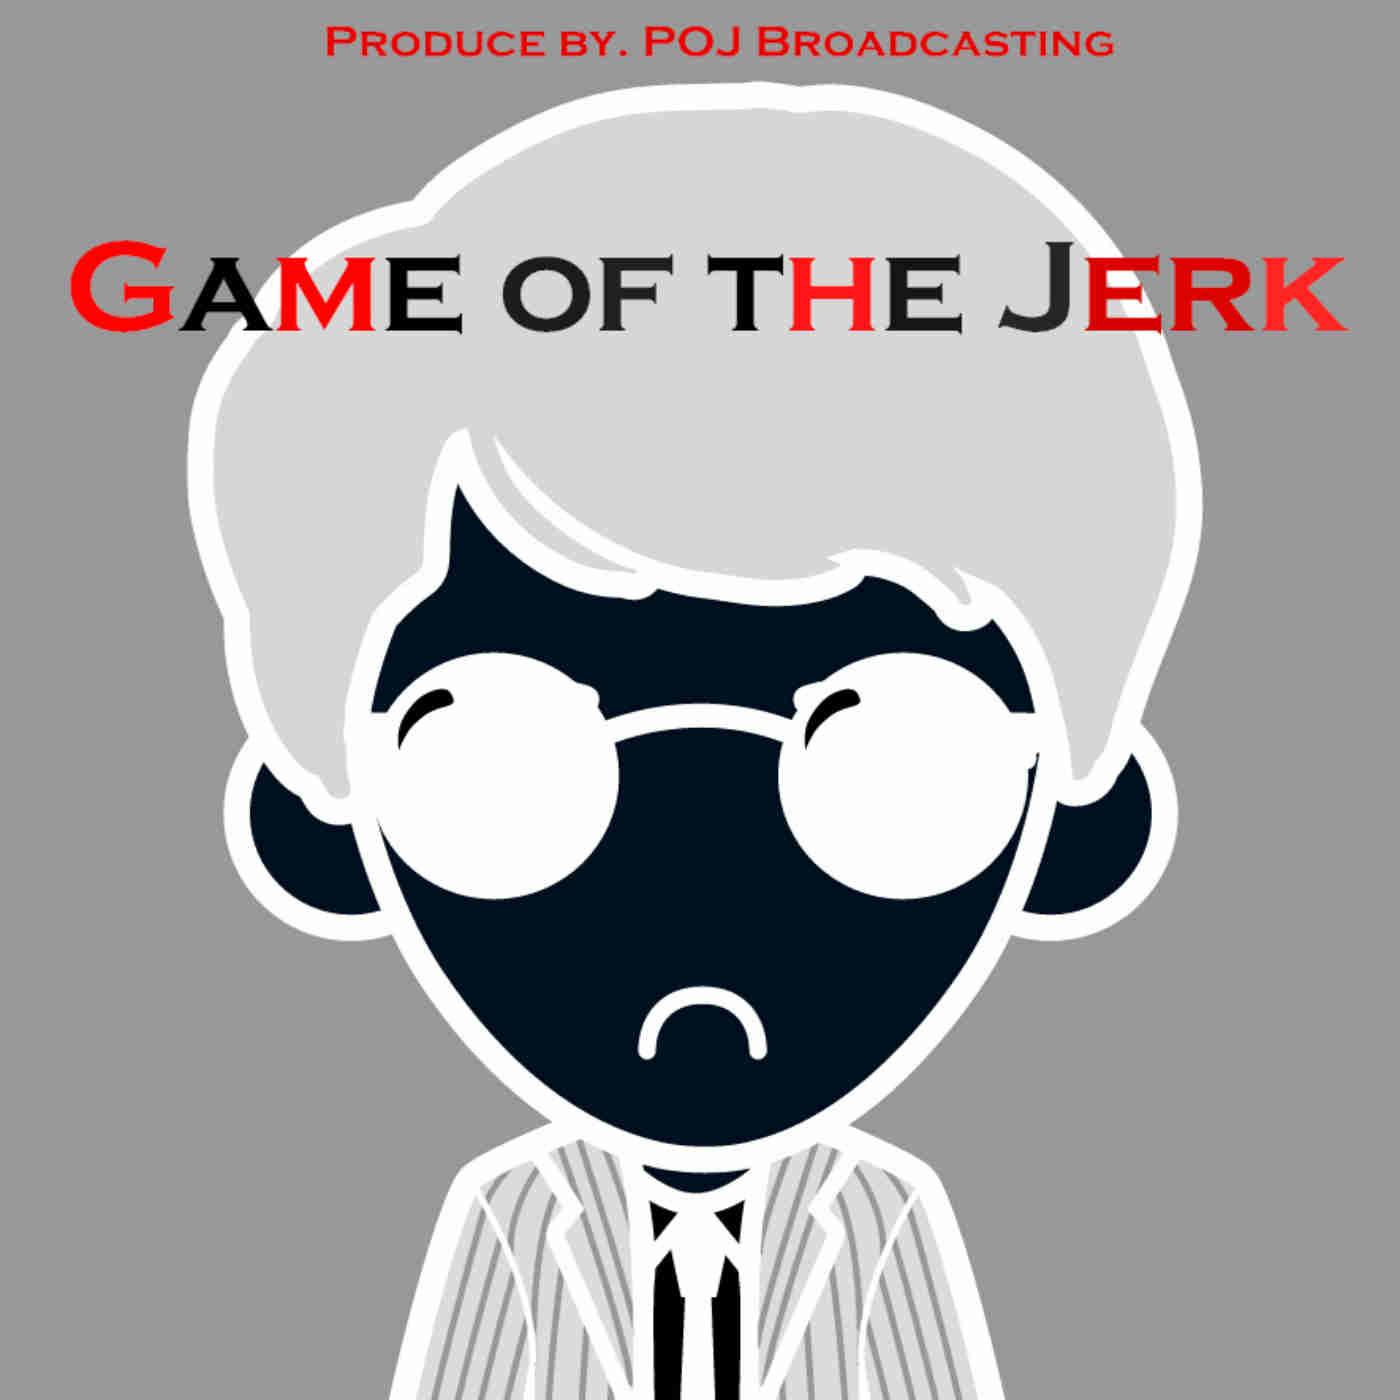 [GOTJ] Game Of The Jerk